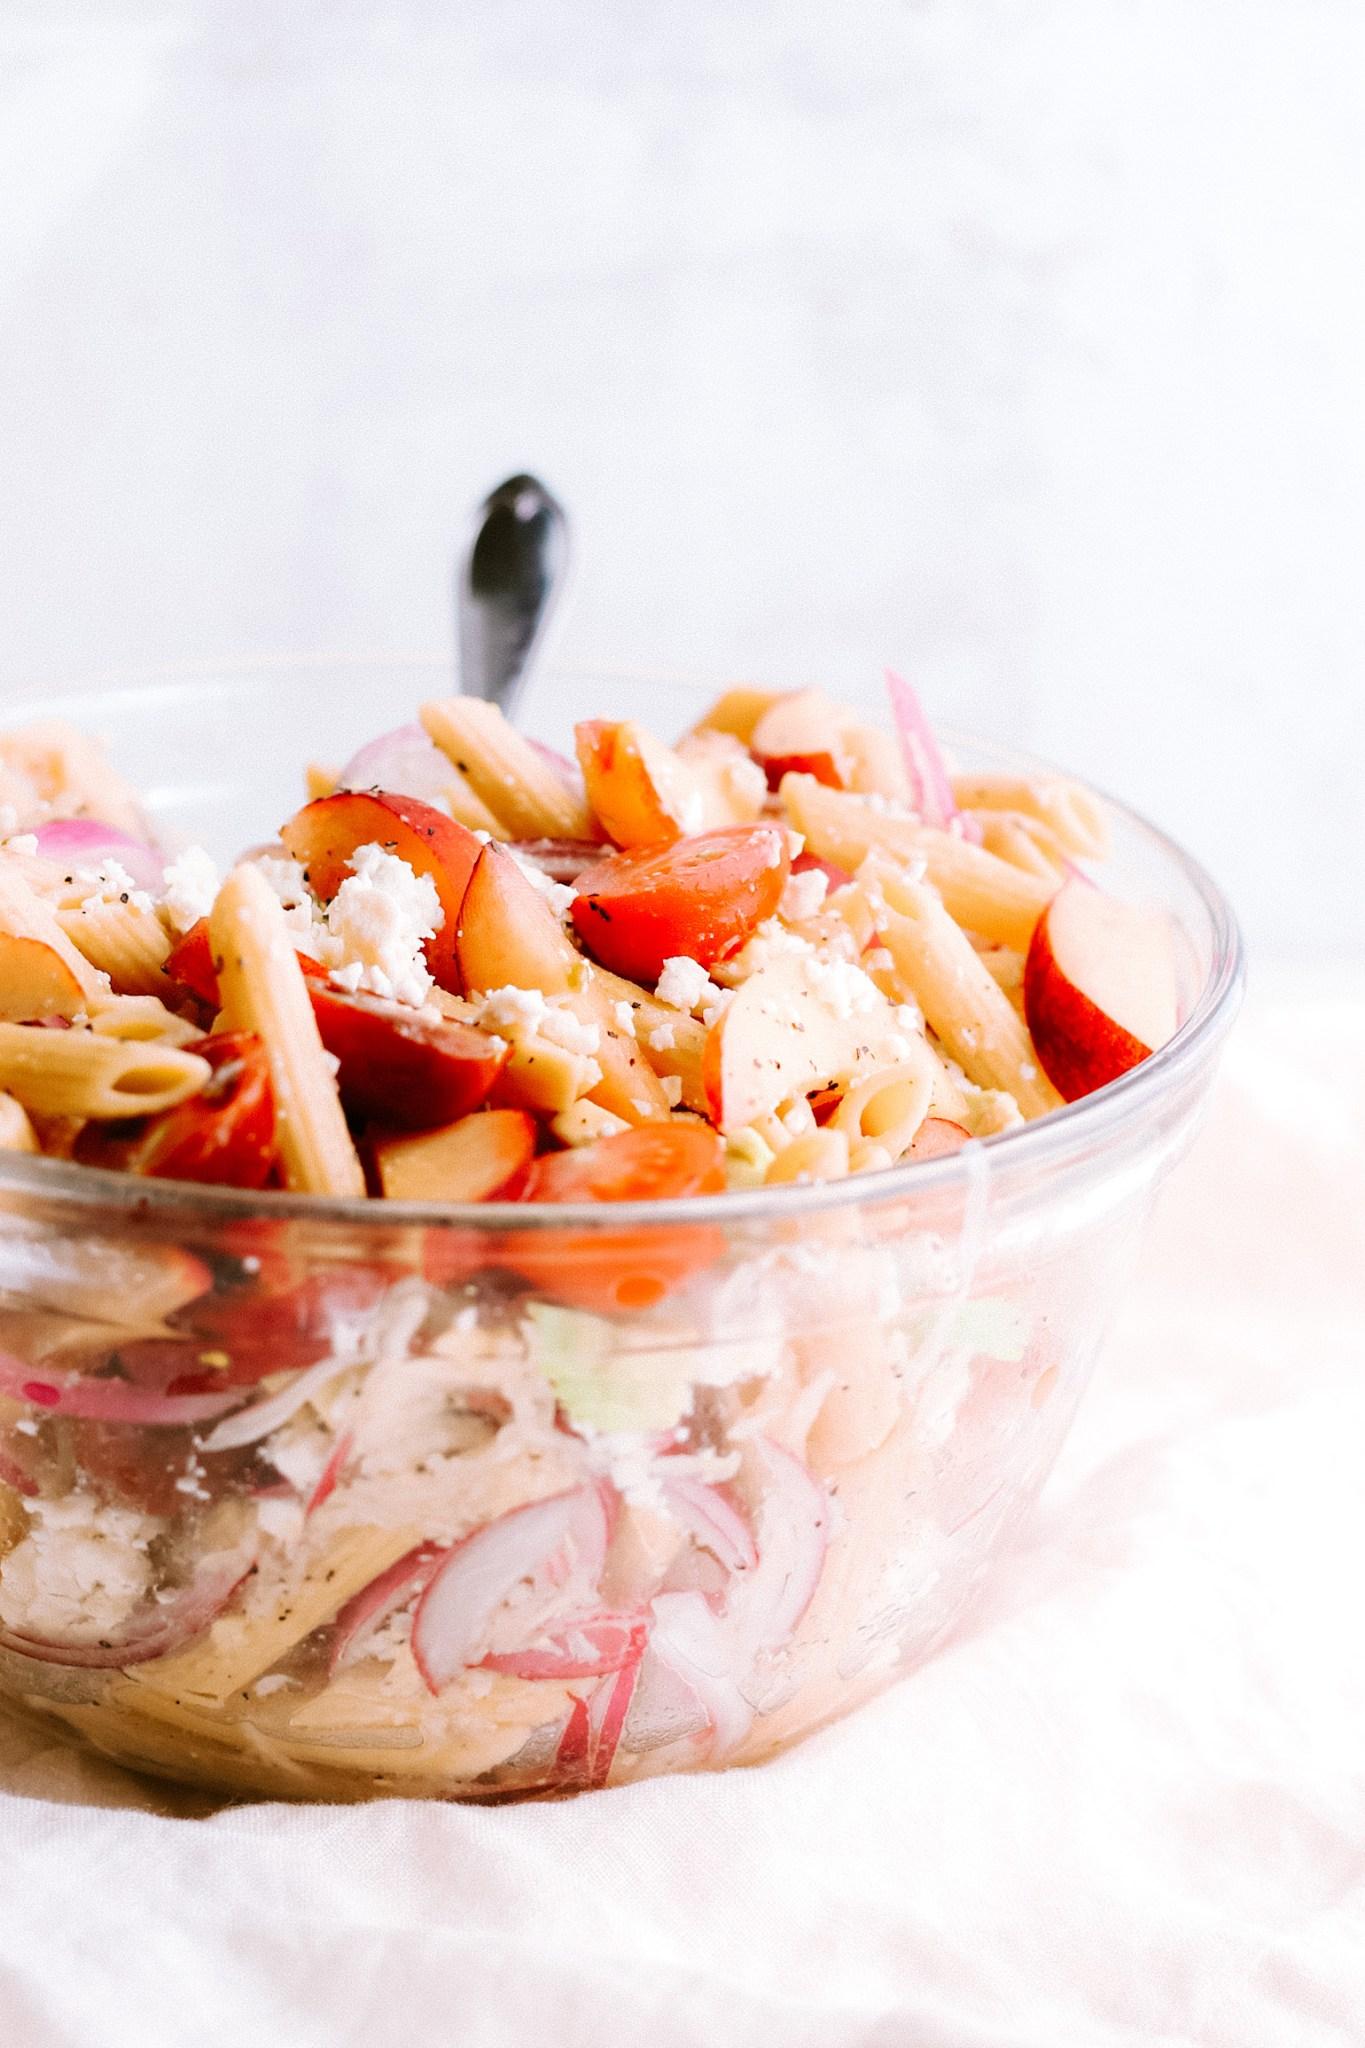 Gluten-Free Peachy Lemon Pasta Salad